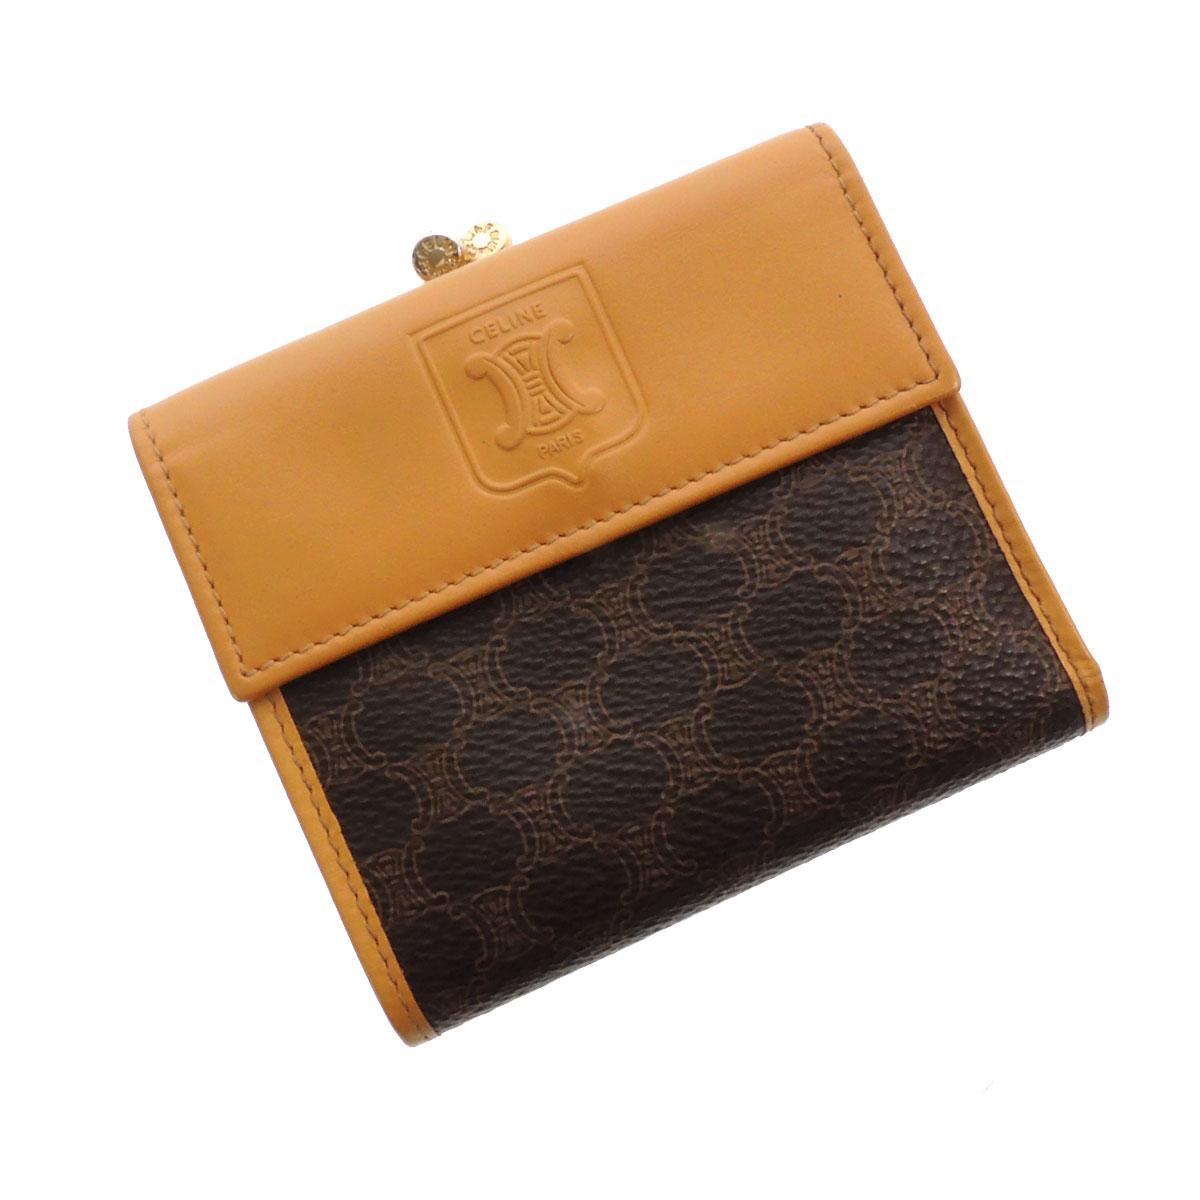 CELINE【セリーヌ】 ガマグチ ロゴ型押 二つ折り財布(小銭入れあり) PVCxレザー レディース 【中古】